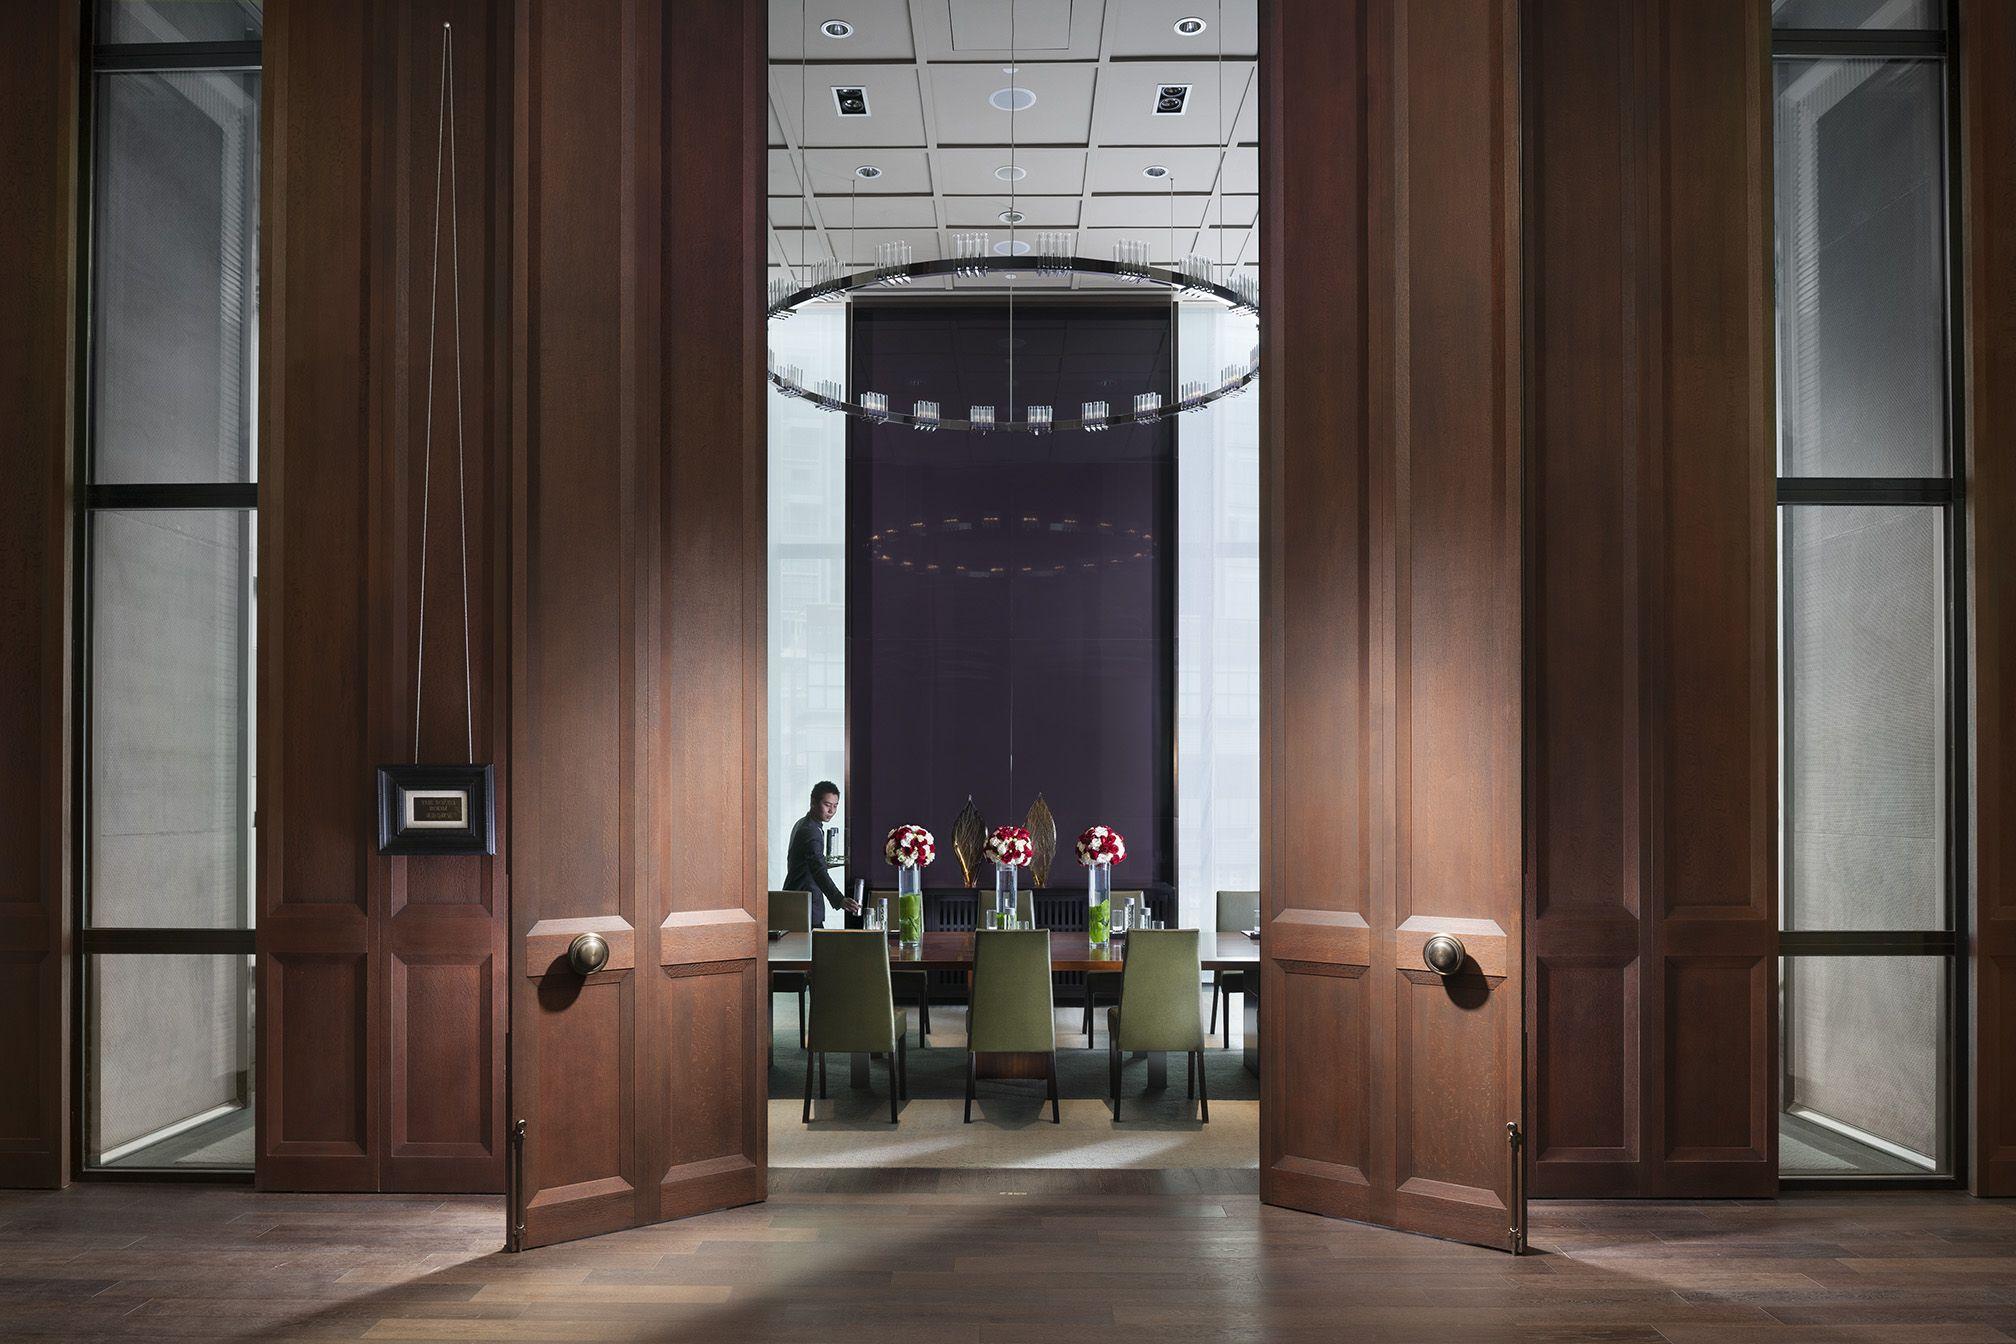 Mandarin Oriental Hotel Guangzhou - Google